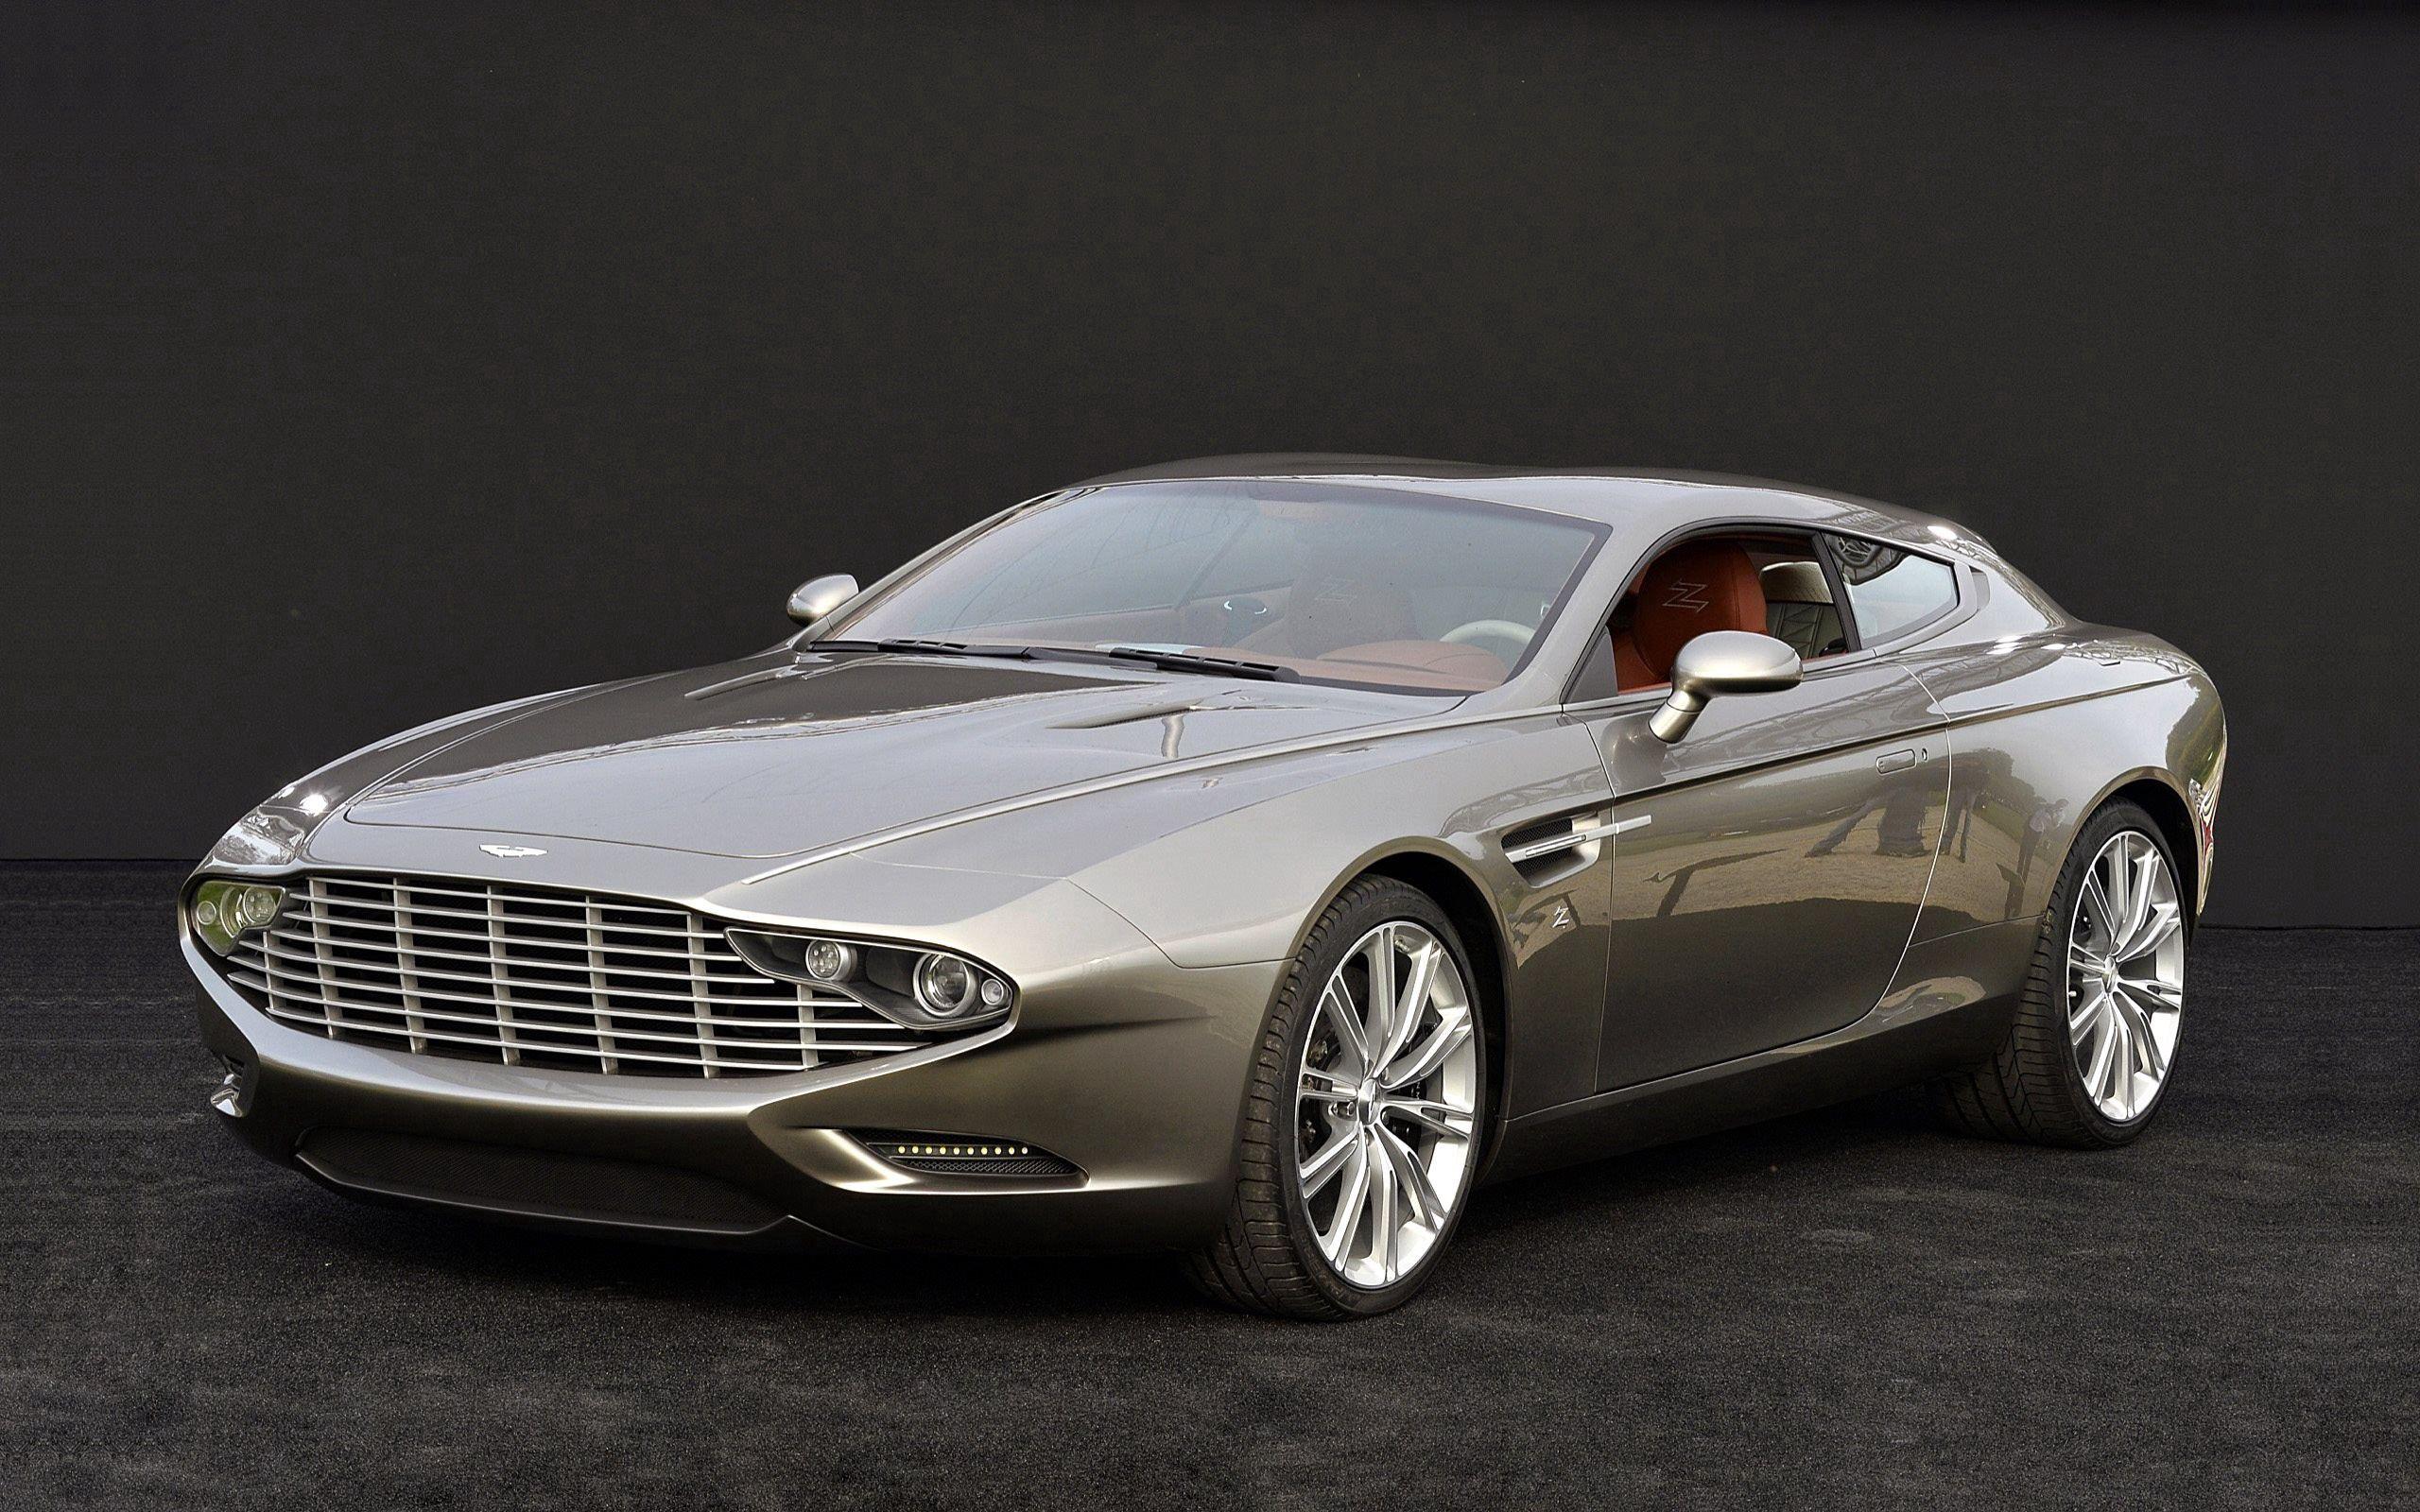 140837 Заставки и Обои Астон Мартин (Aston Martin) на телефон. Скачать Астон Мартин (Aston Martin), Тачки (Cars), Zagato, Virage картинки бесплатно